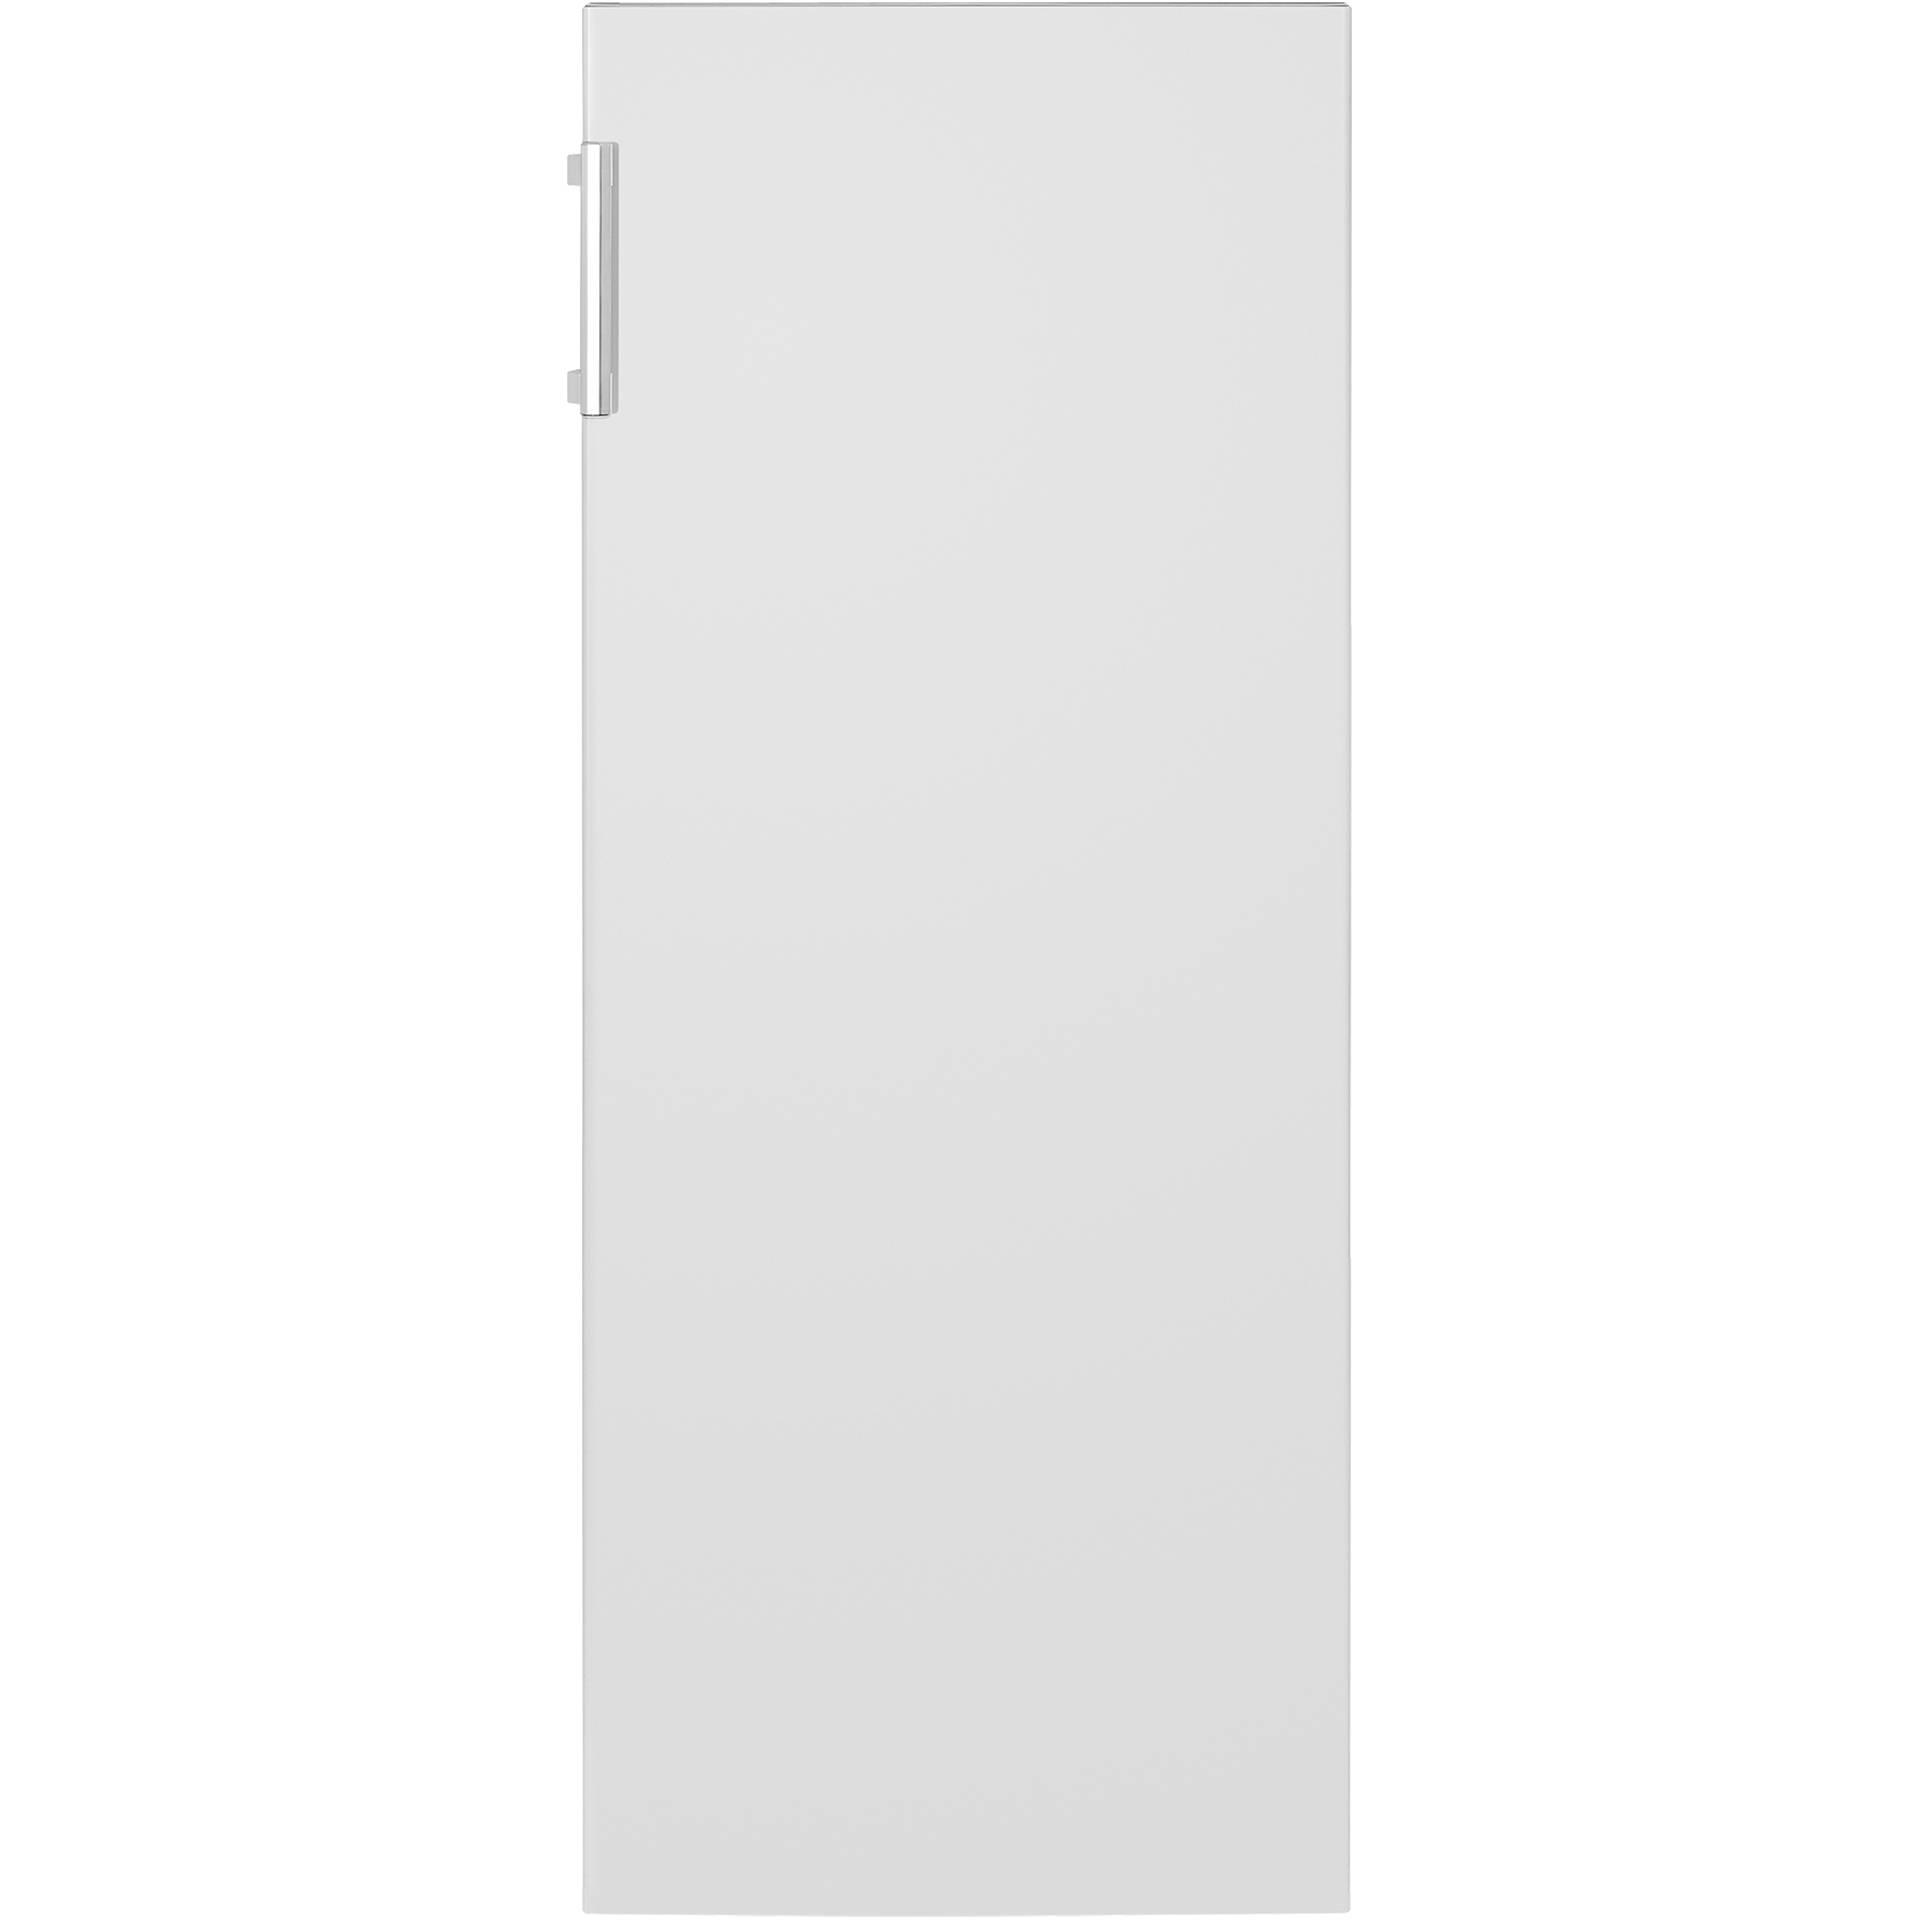 Bomann VS 7316.1 weiß